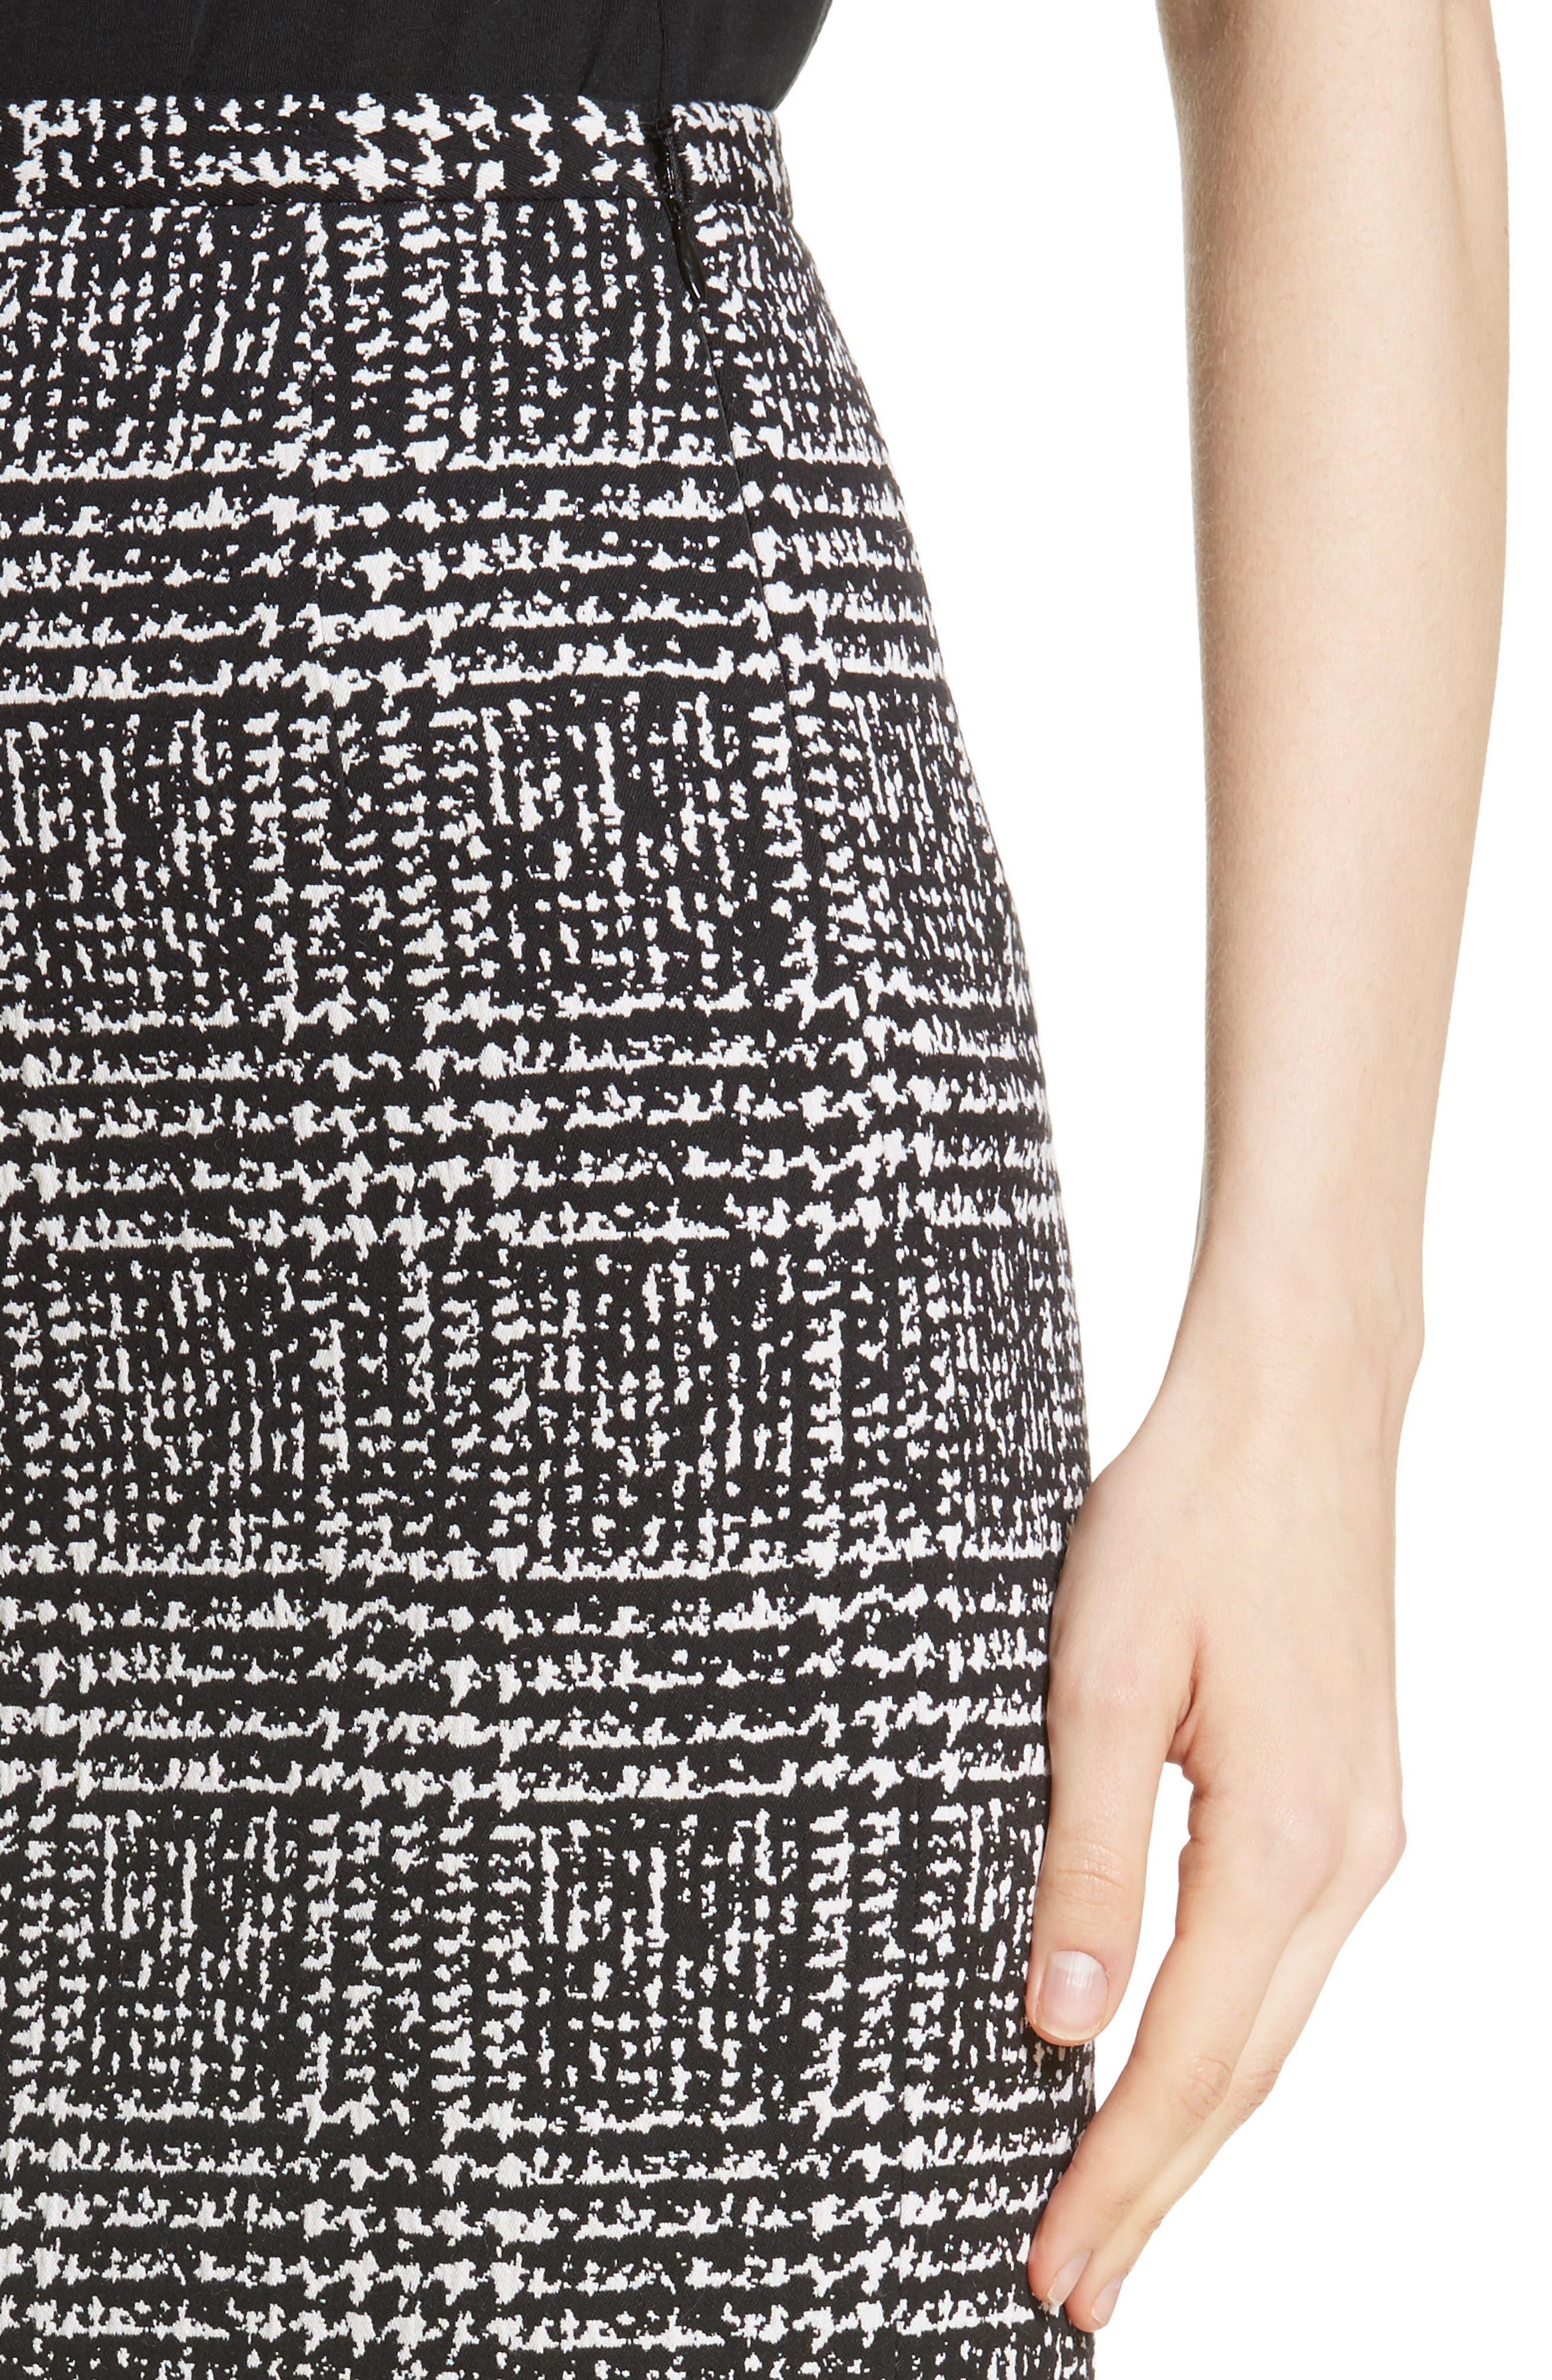 Glen Plaid Stretch Jacquard Skirt,                             Alternate thumbnail 4, color,                             001